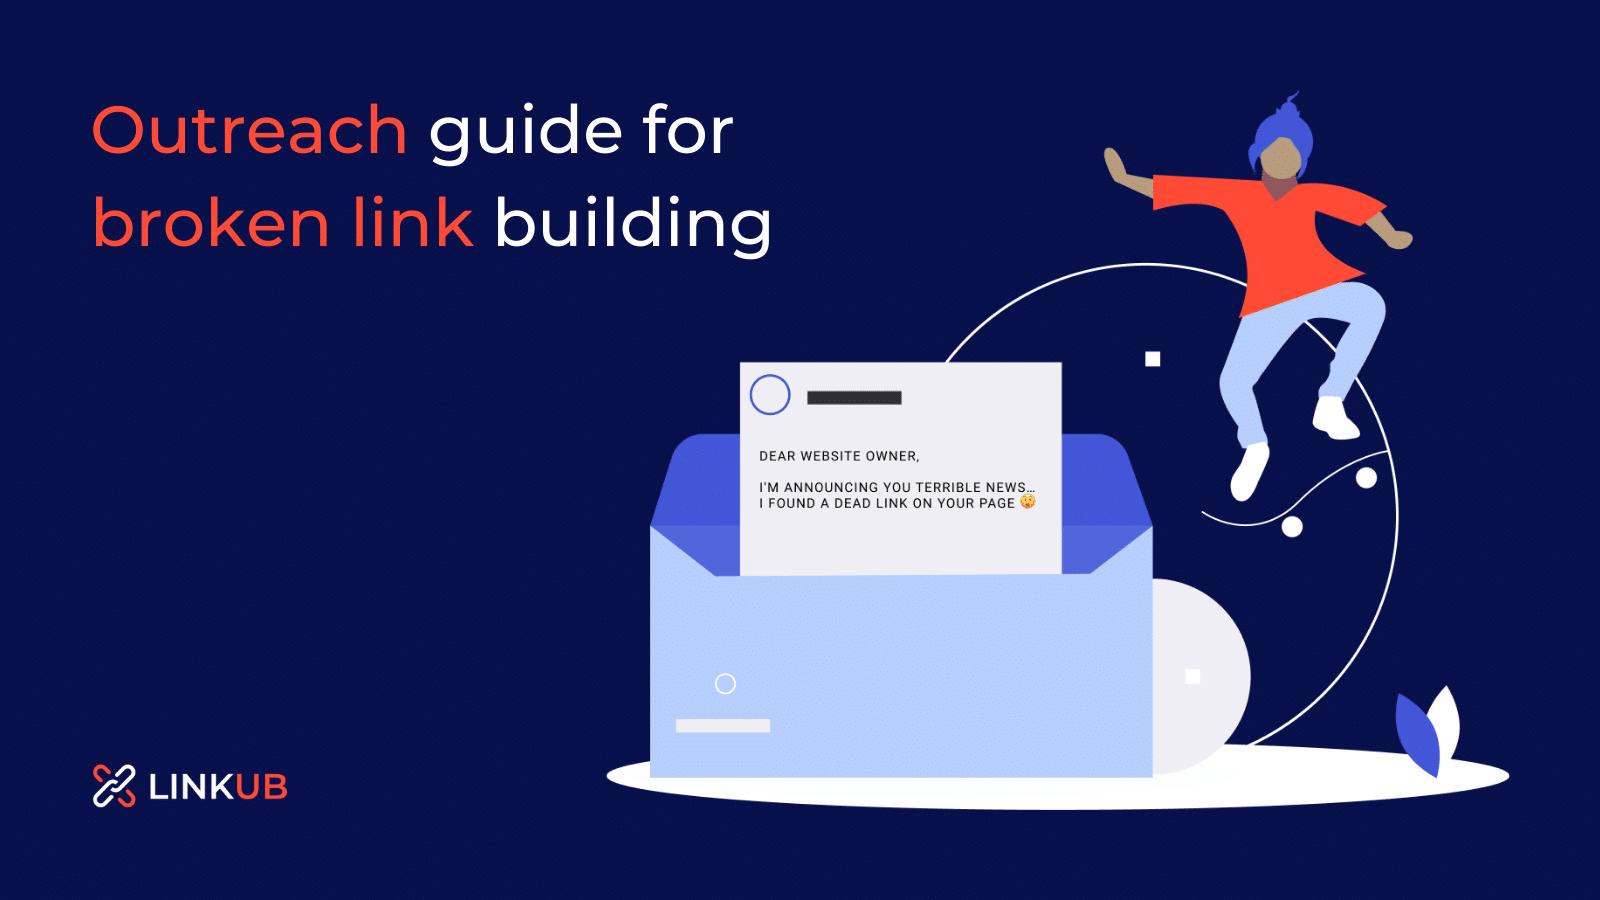 outreach guide for broken link